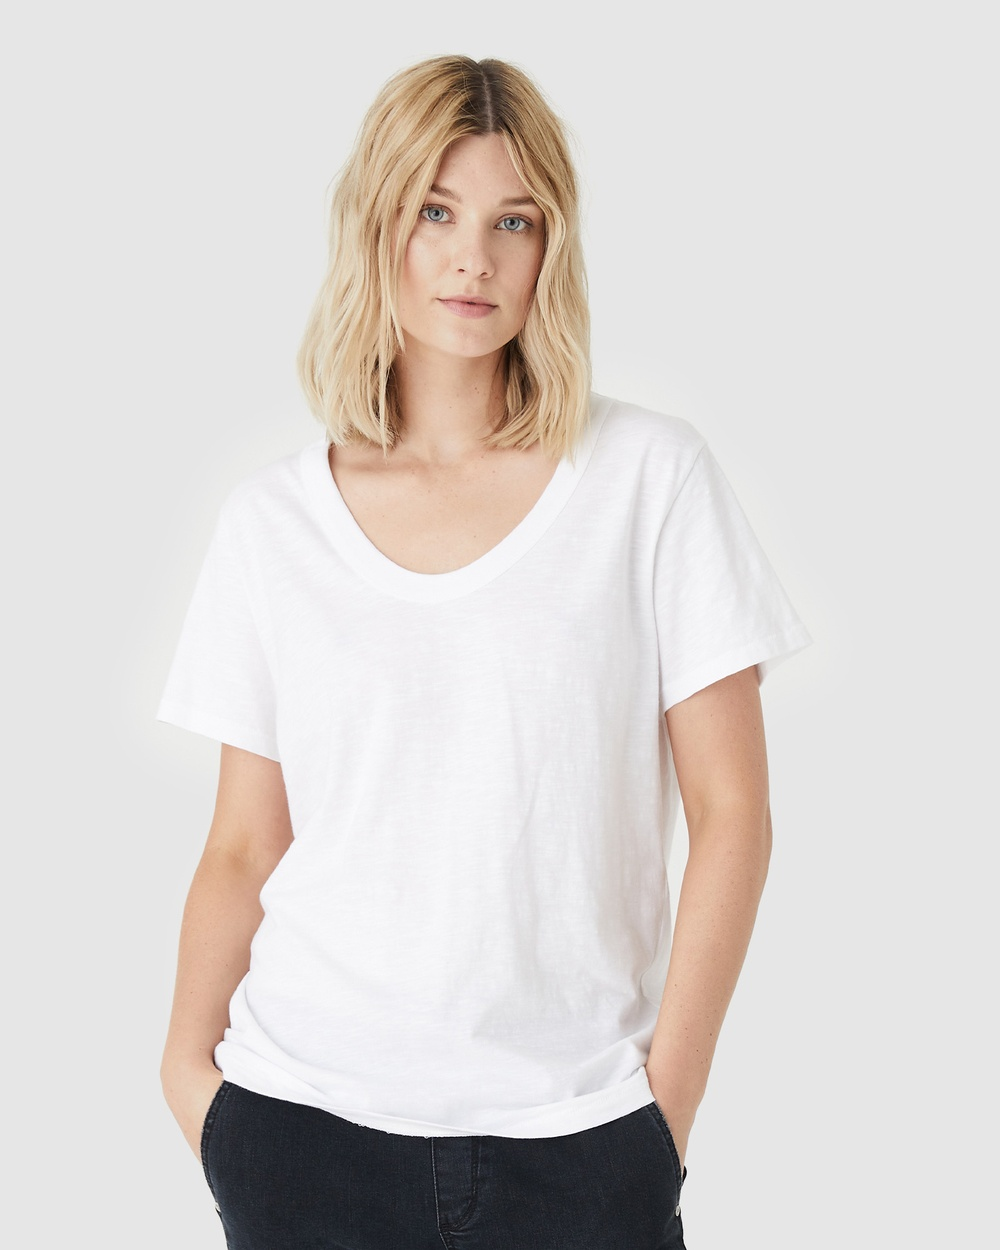 Jac & Mooki - Jess Tee - T-Shirts & Singlets (white) Jess Tee